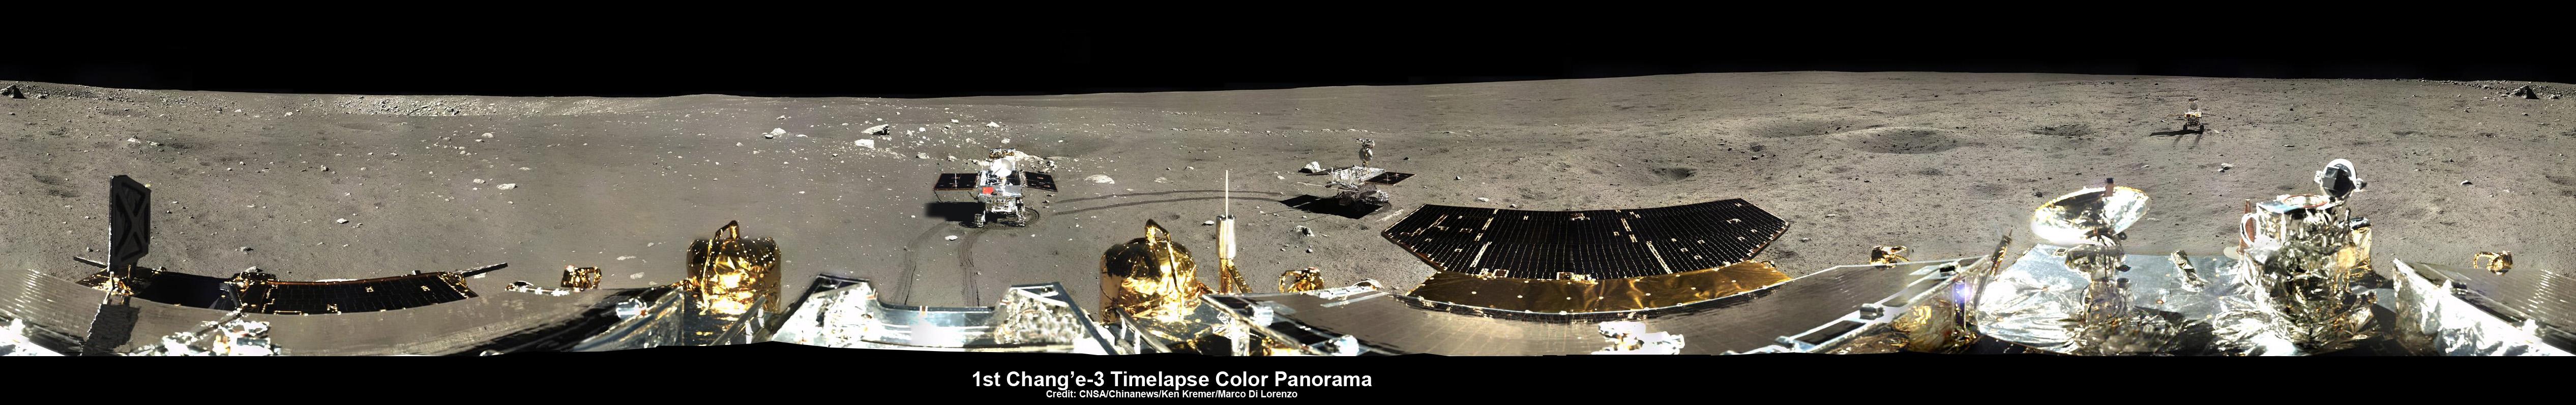 Chang'e-3, Yutu Rover Time-Lapse Panoramic